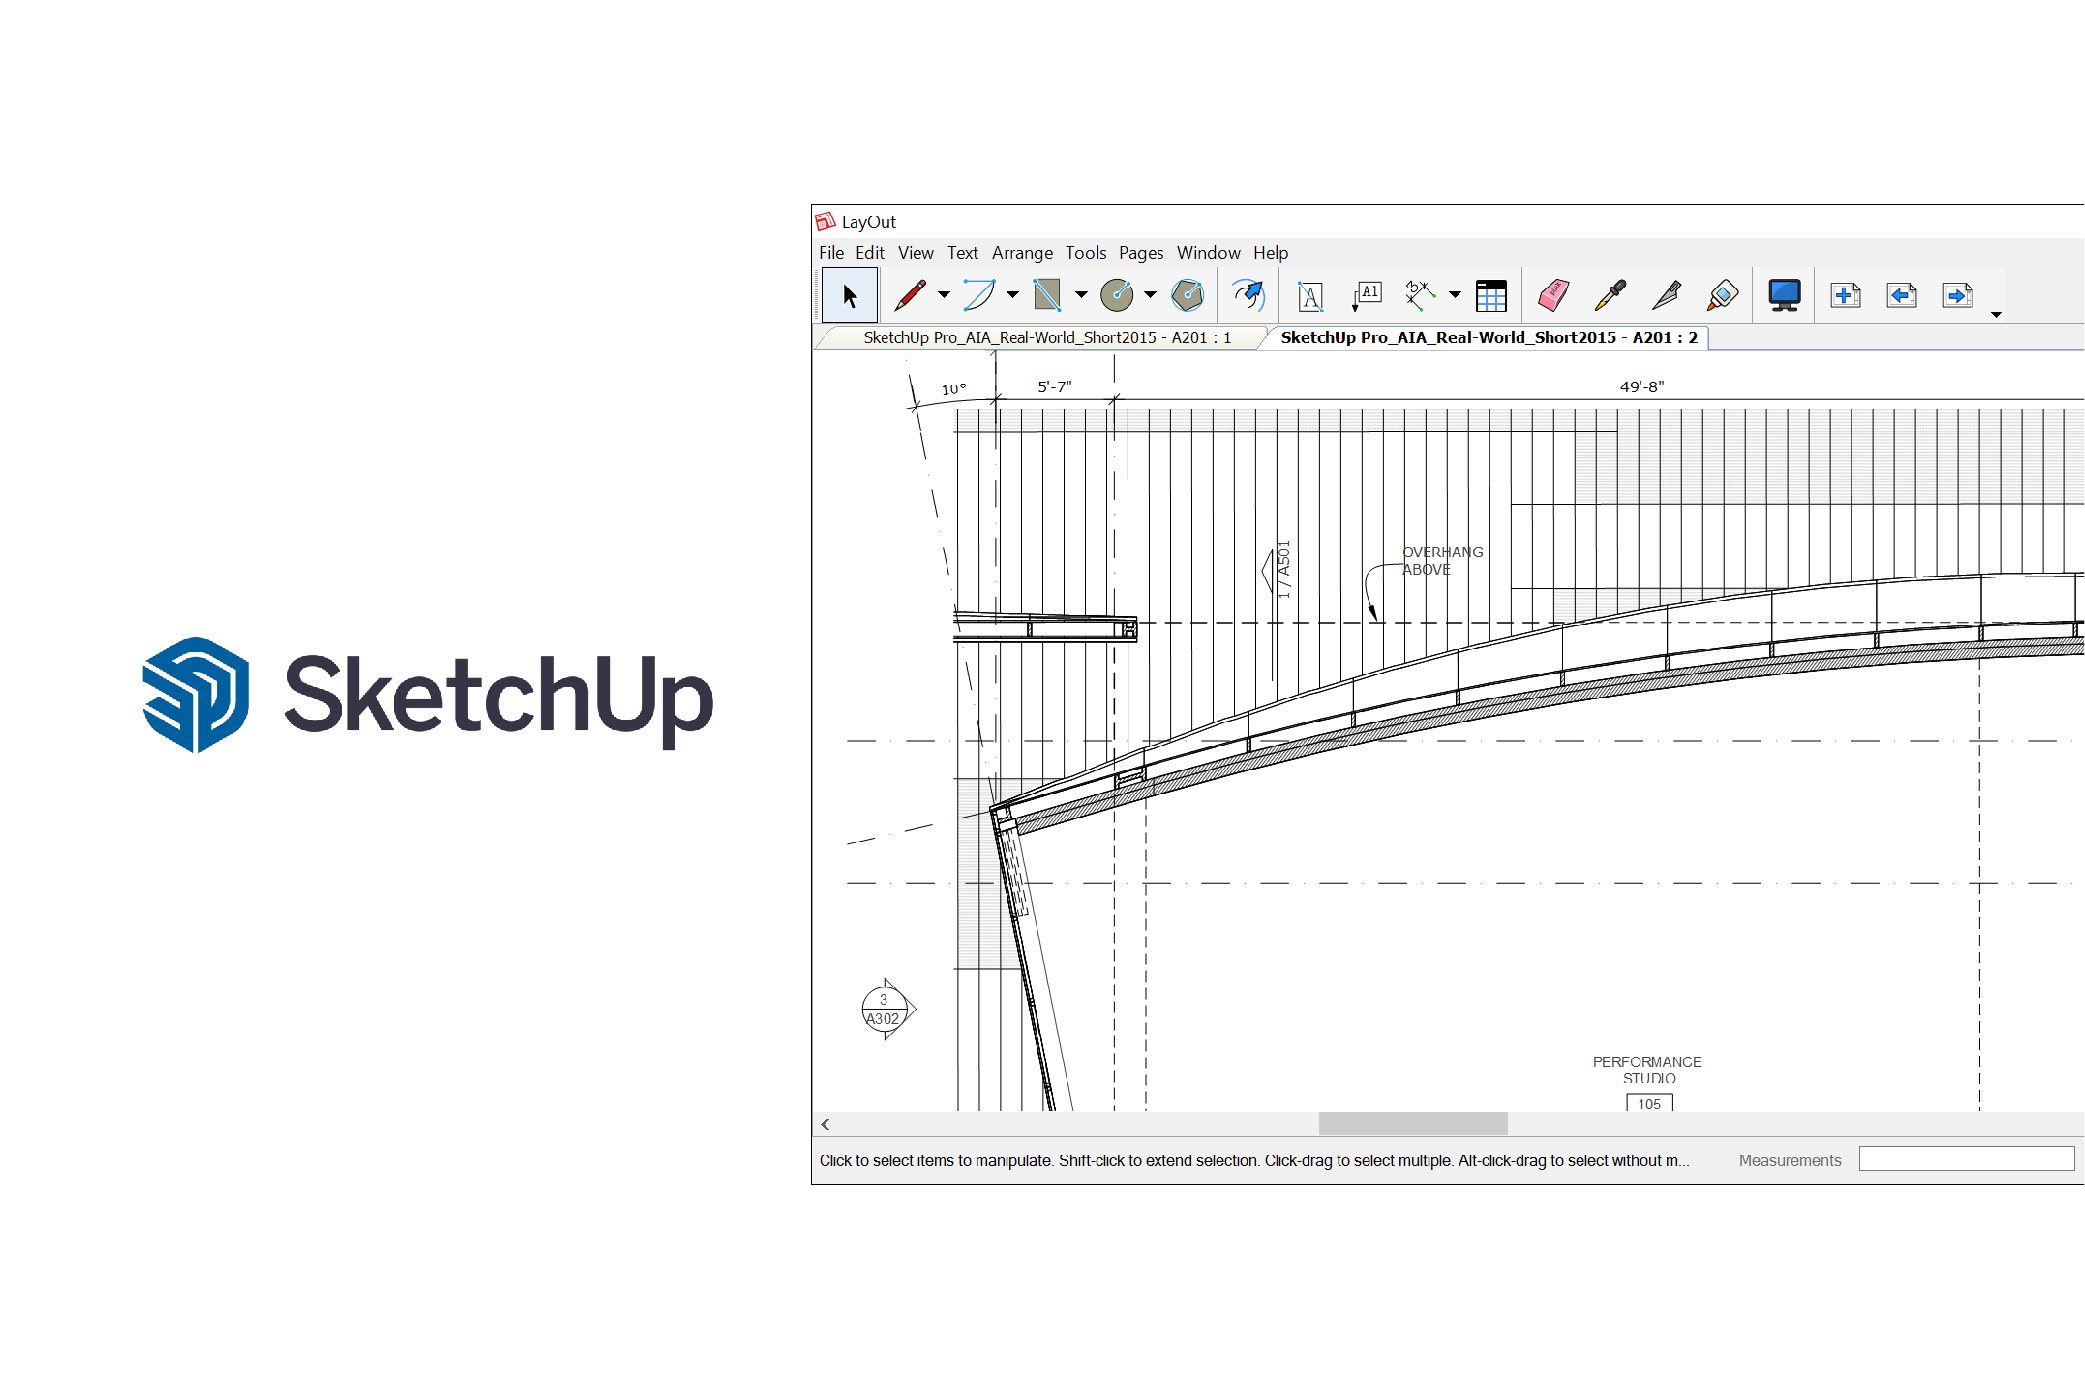 Sketchup software user interface